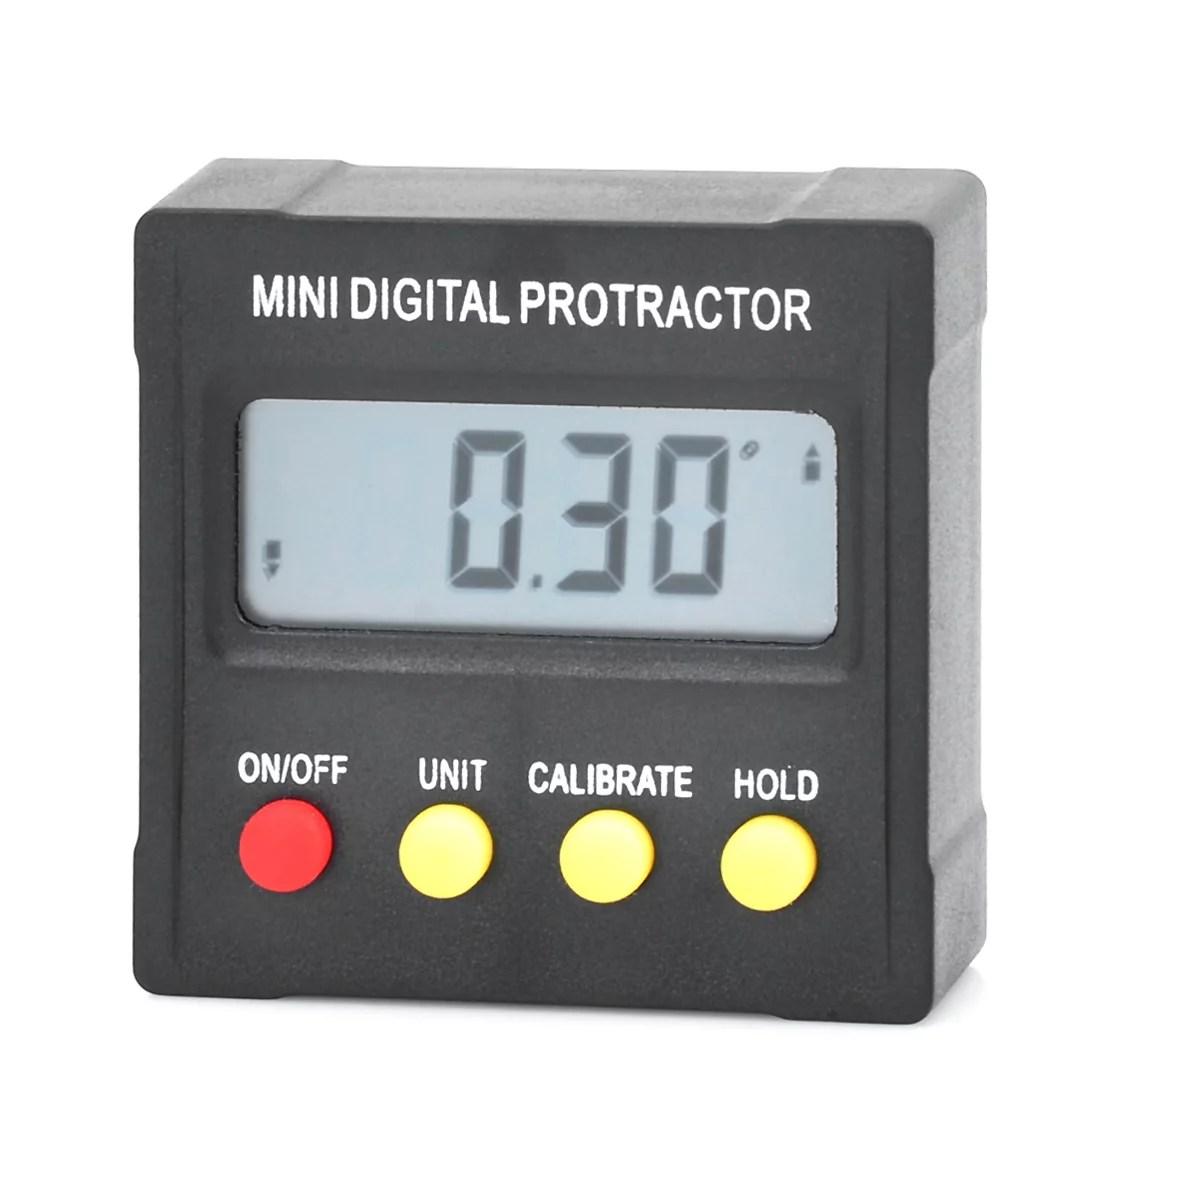 Husky Digital Protractor Manual